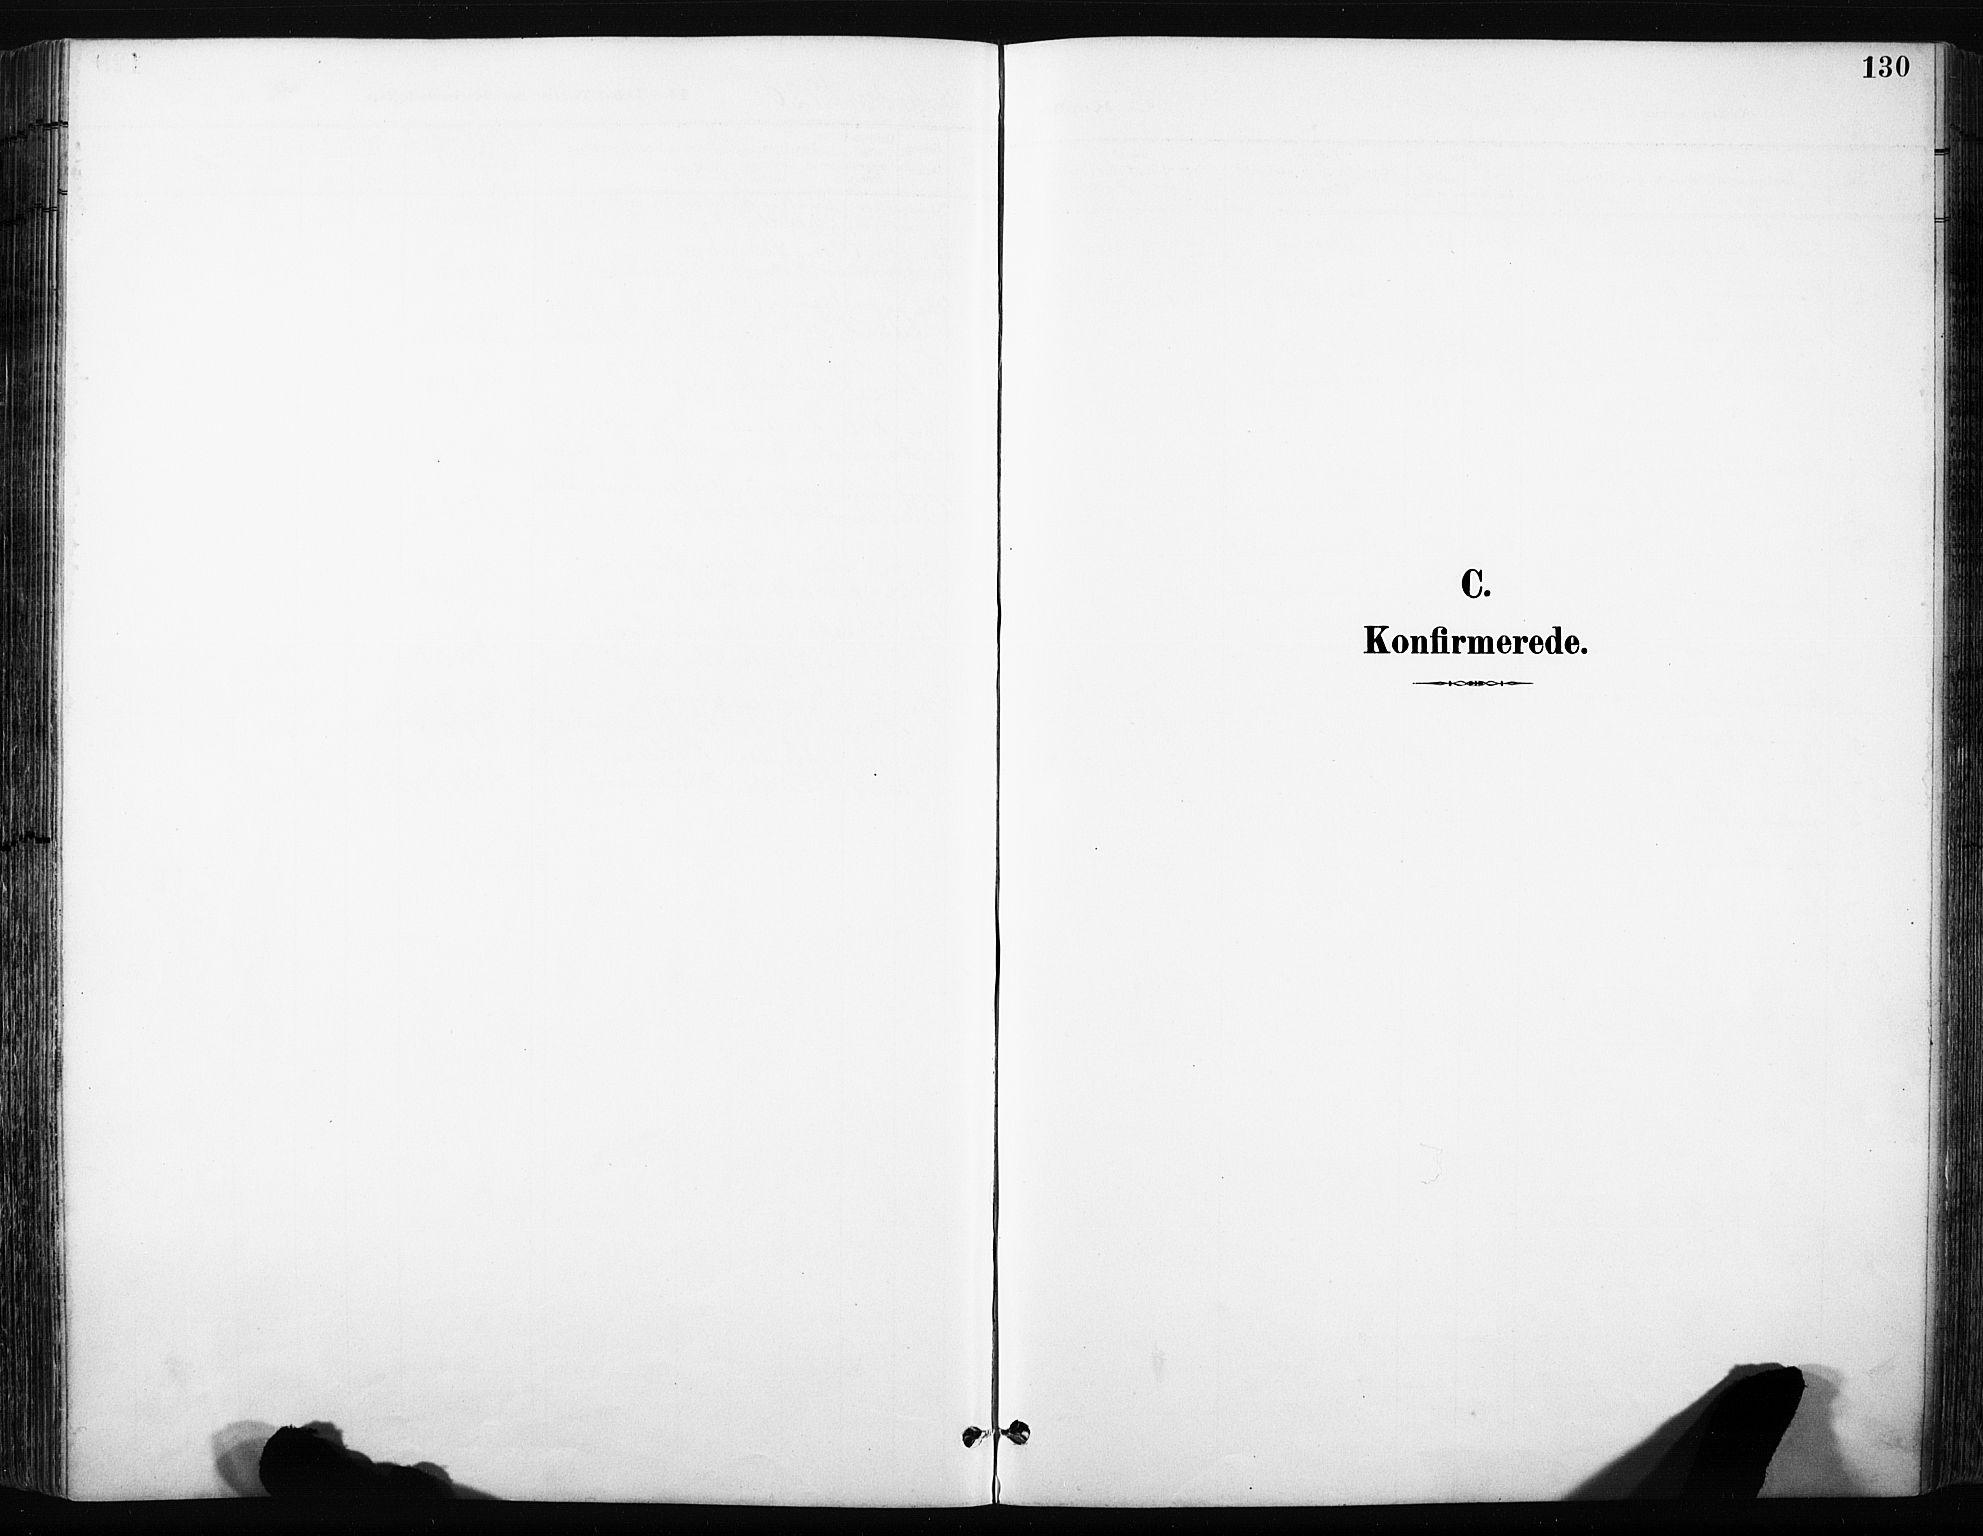 SAH, Skjåk prestekontor, Klokkerbok nr. 3, 1893-1932, s. 130